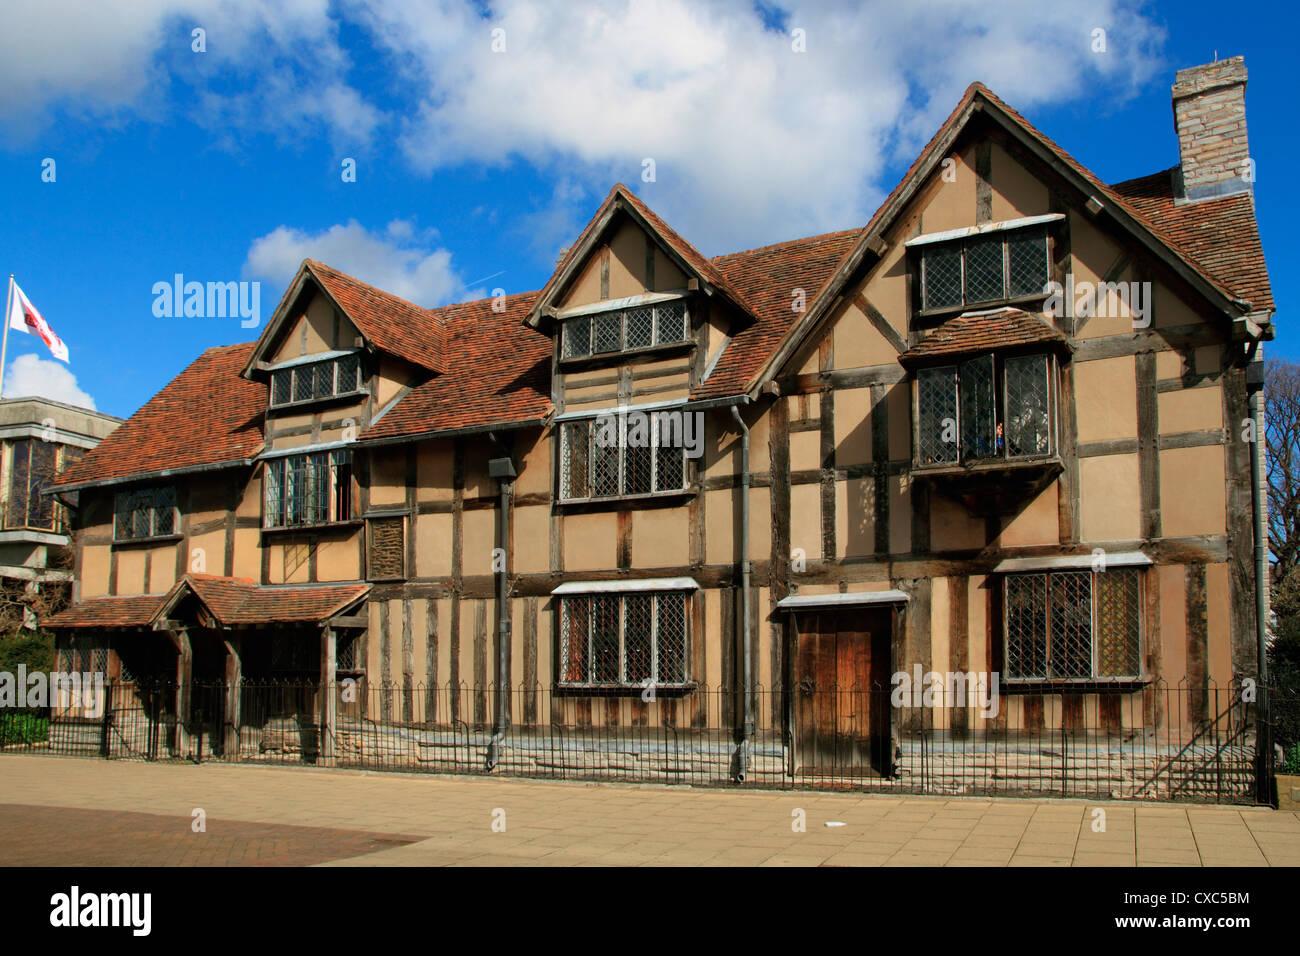 Shakespeares Birthplace Stratford Upon Avon Warwickshire England United Kingdom Europe